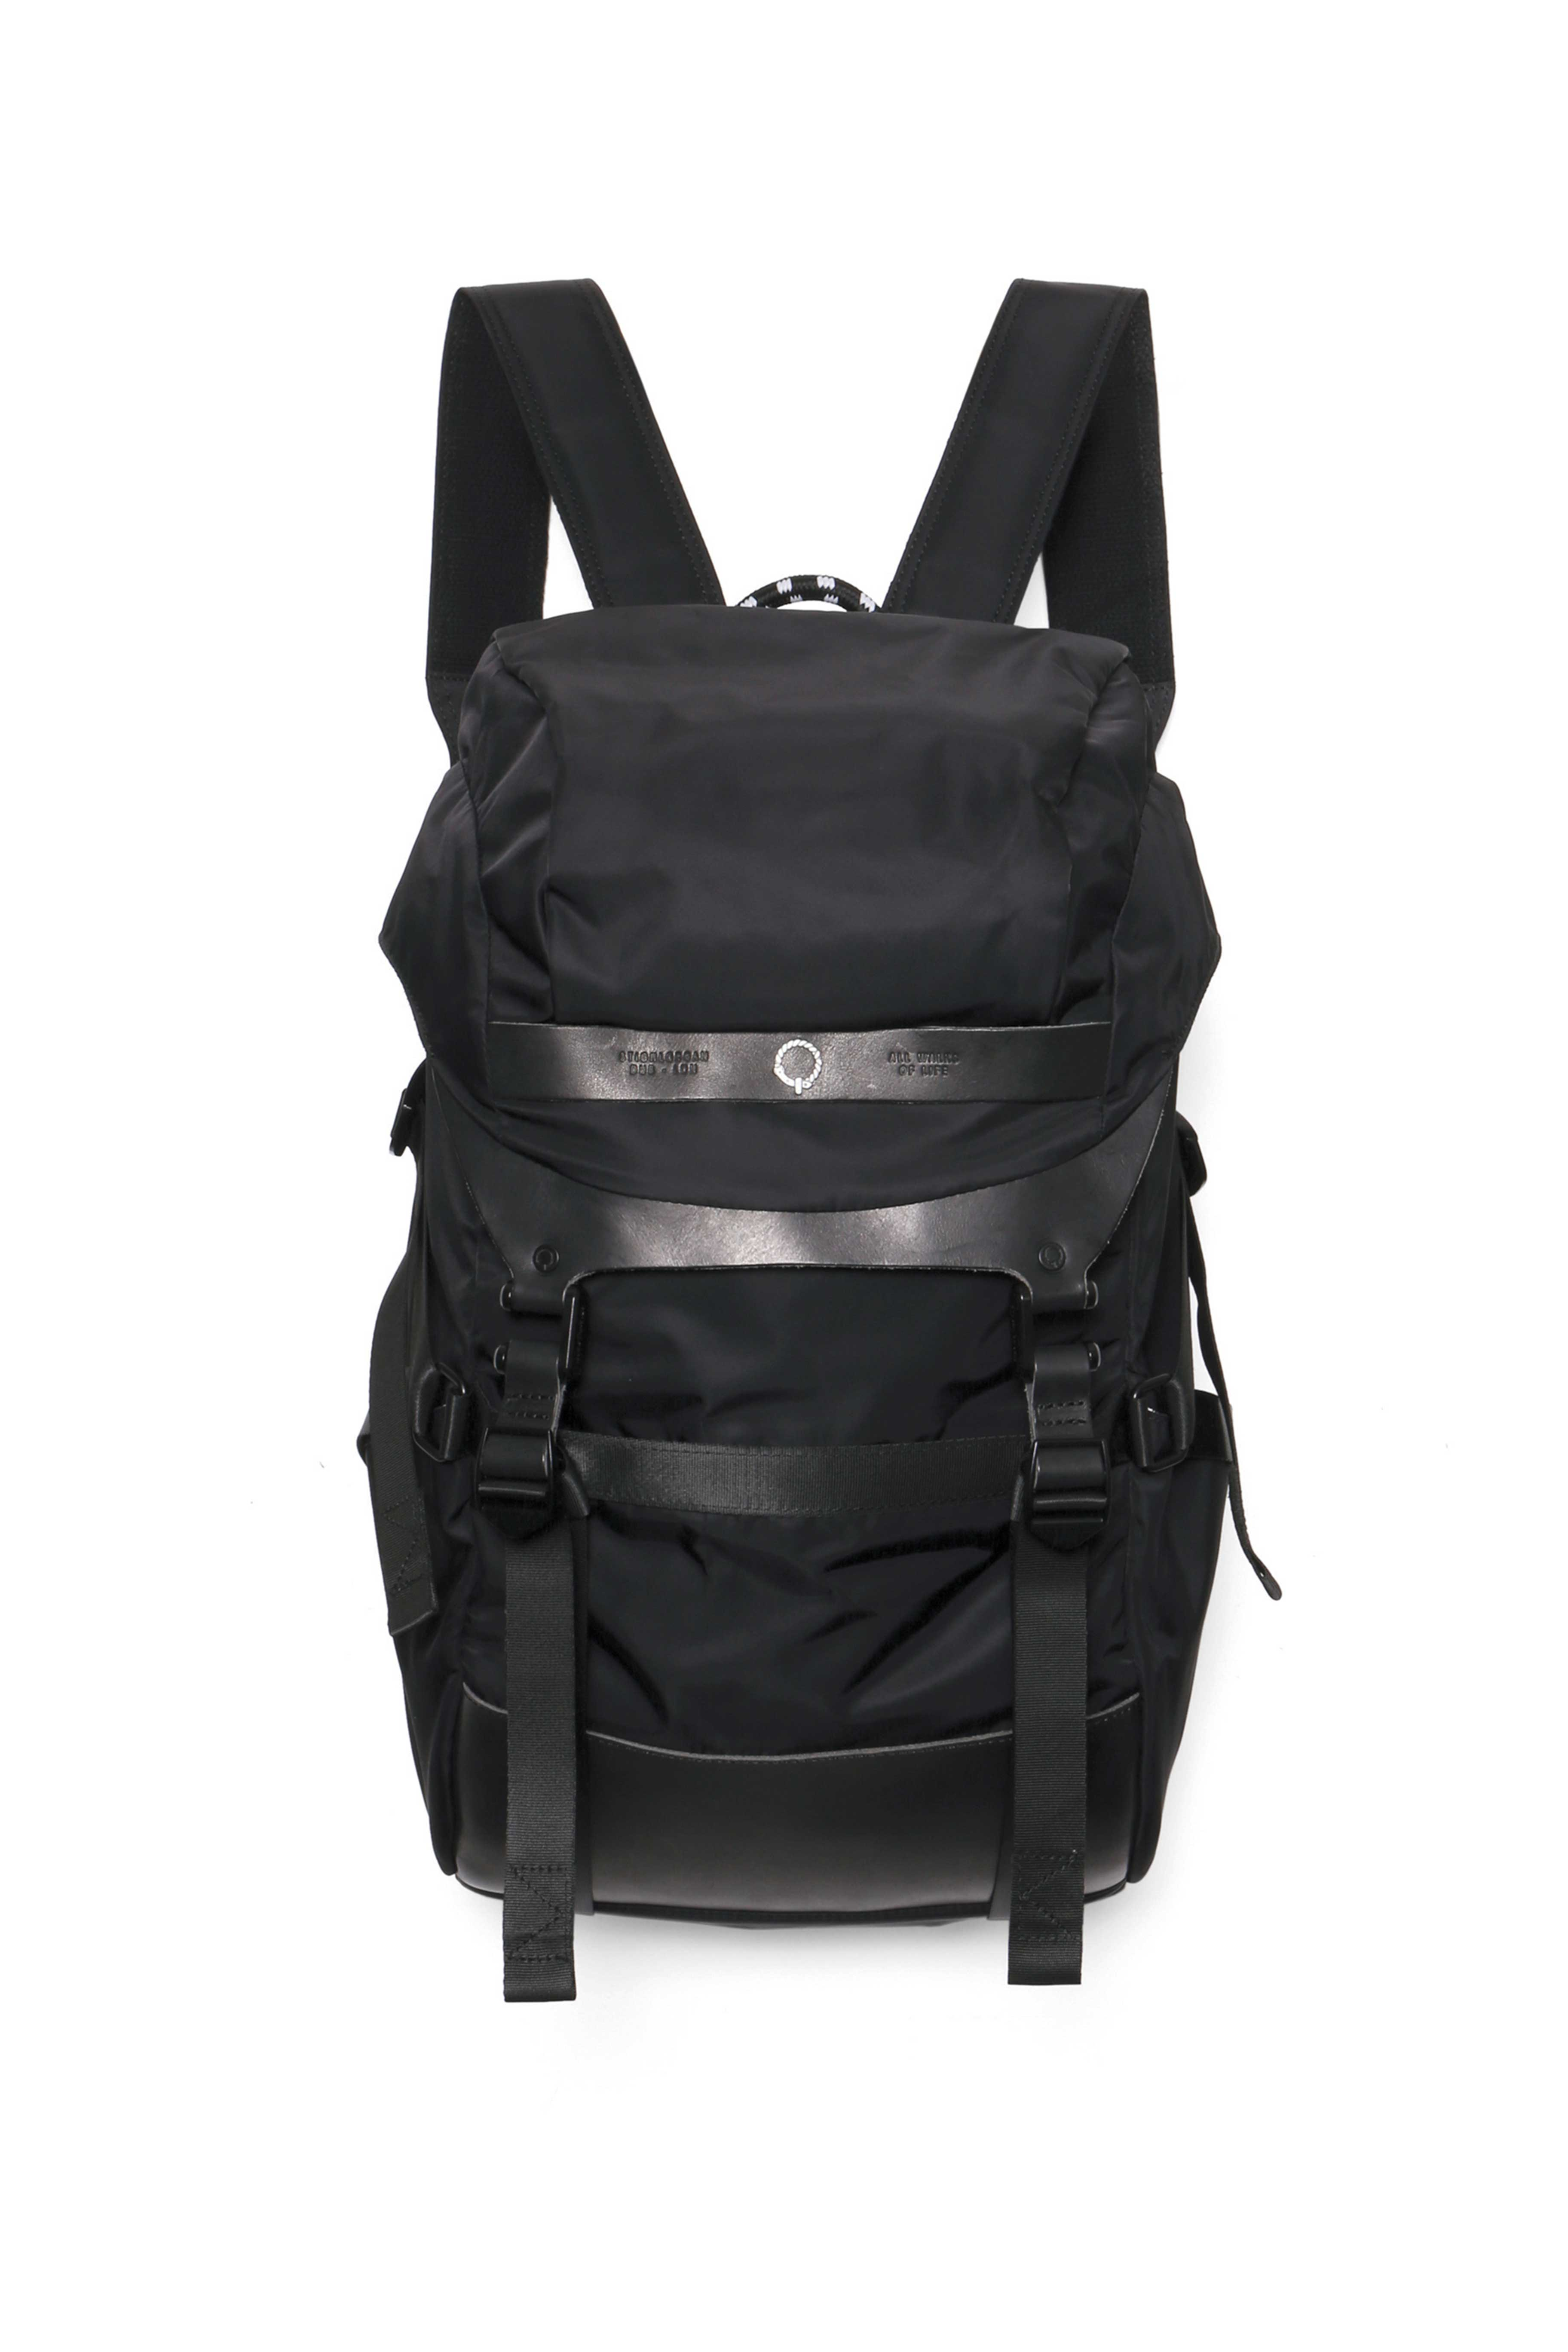 Stighlorgan - Drawstring backpacks 3582235765290